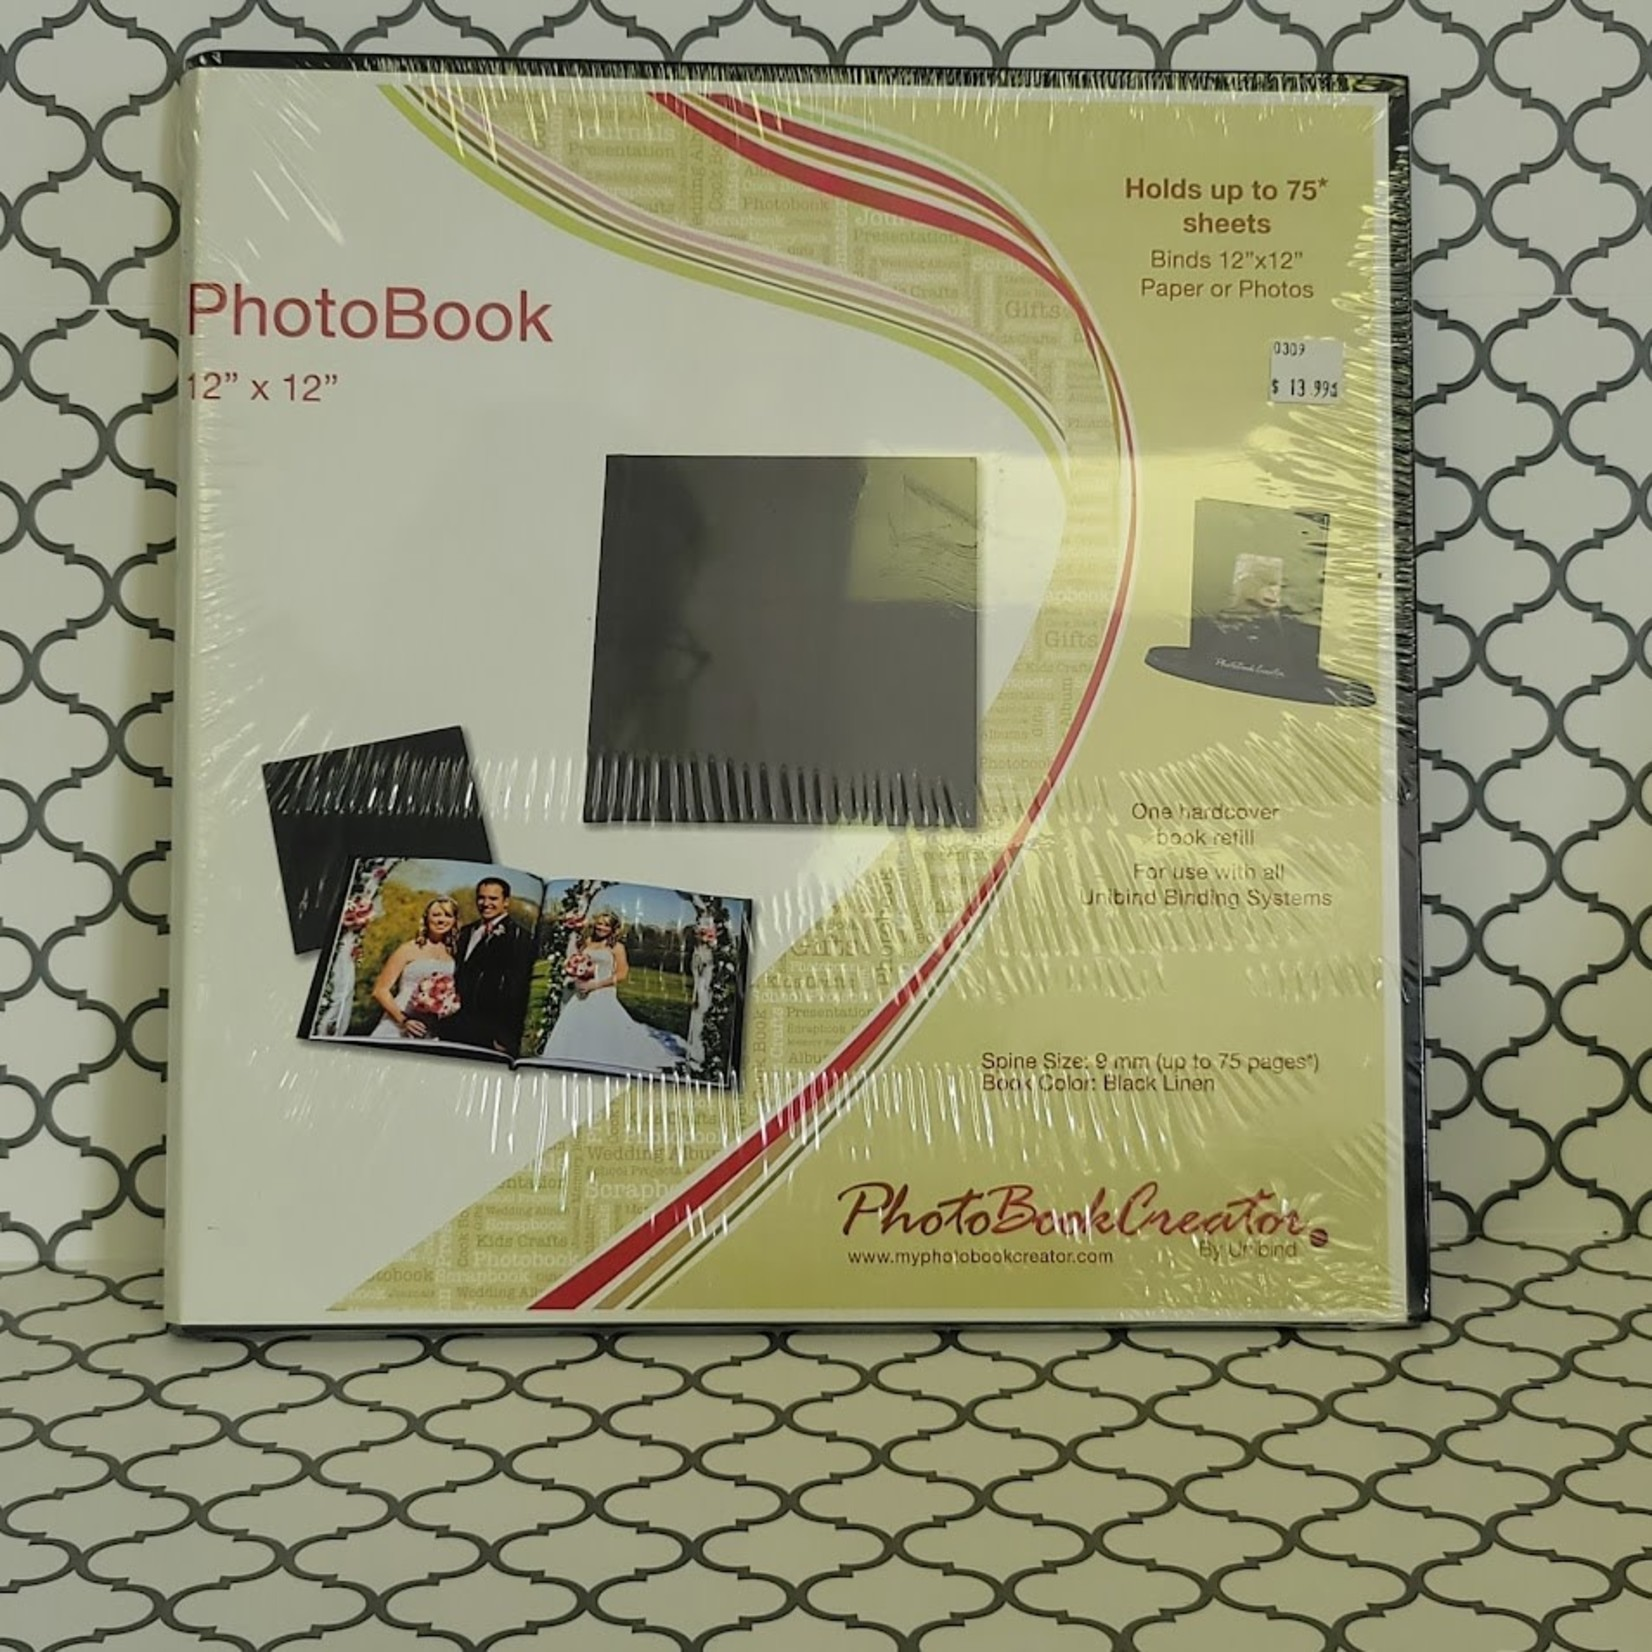 "PhotoBook Creator by Unibind - 12"" x 12"" PhotoBook"